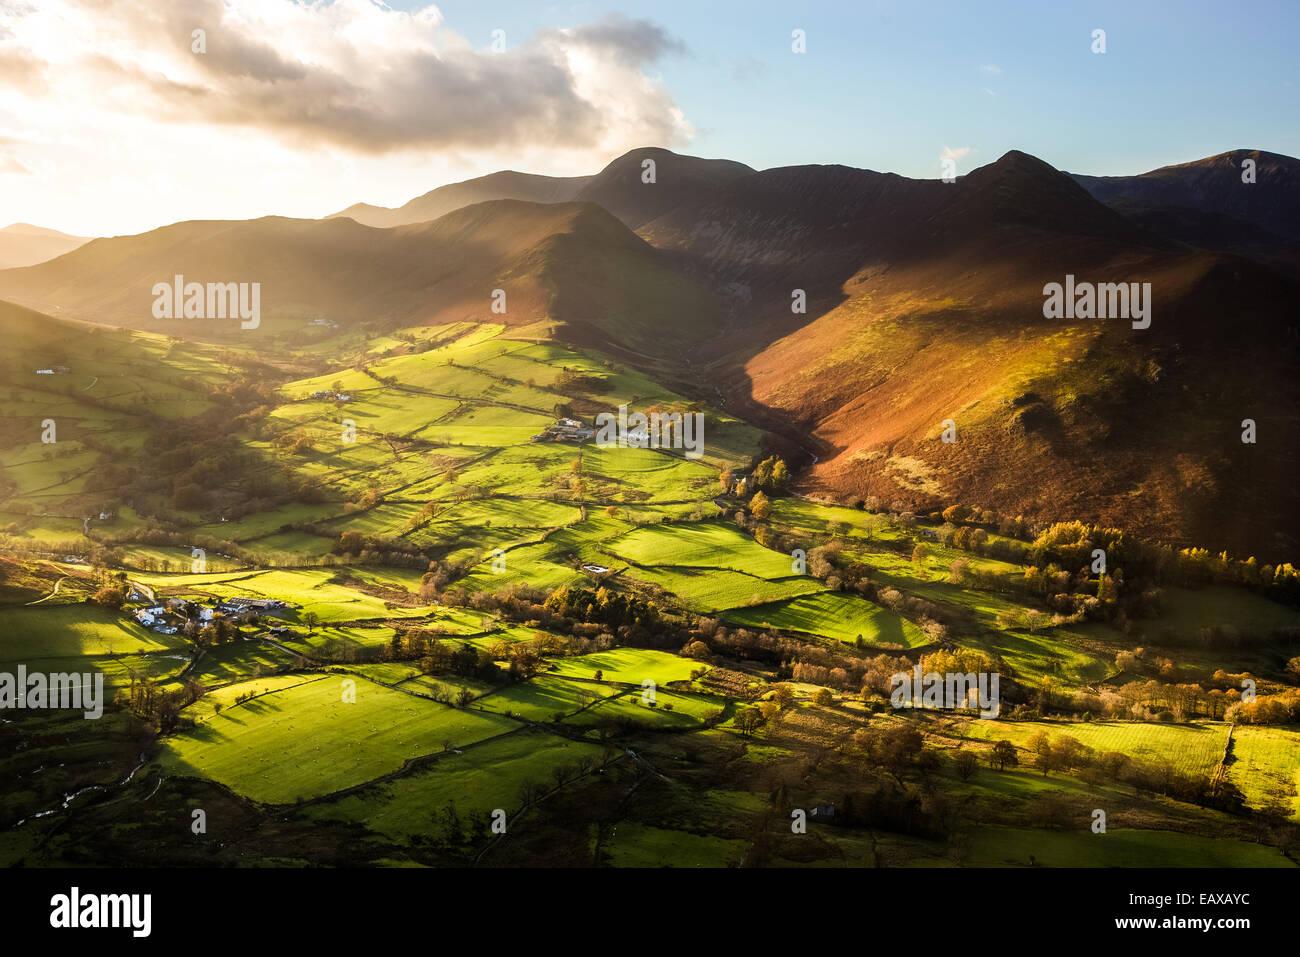 Striking autumnal sunlight illuminates the Newlands Valley viewed from the summit of Cat Bells near Derwent Water. - Stock Image